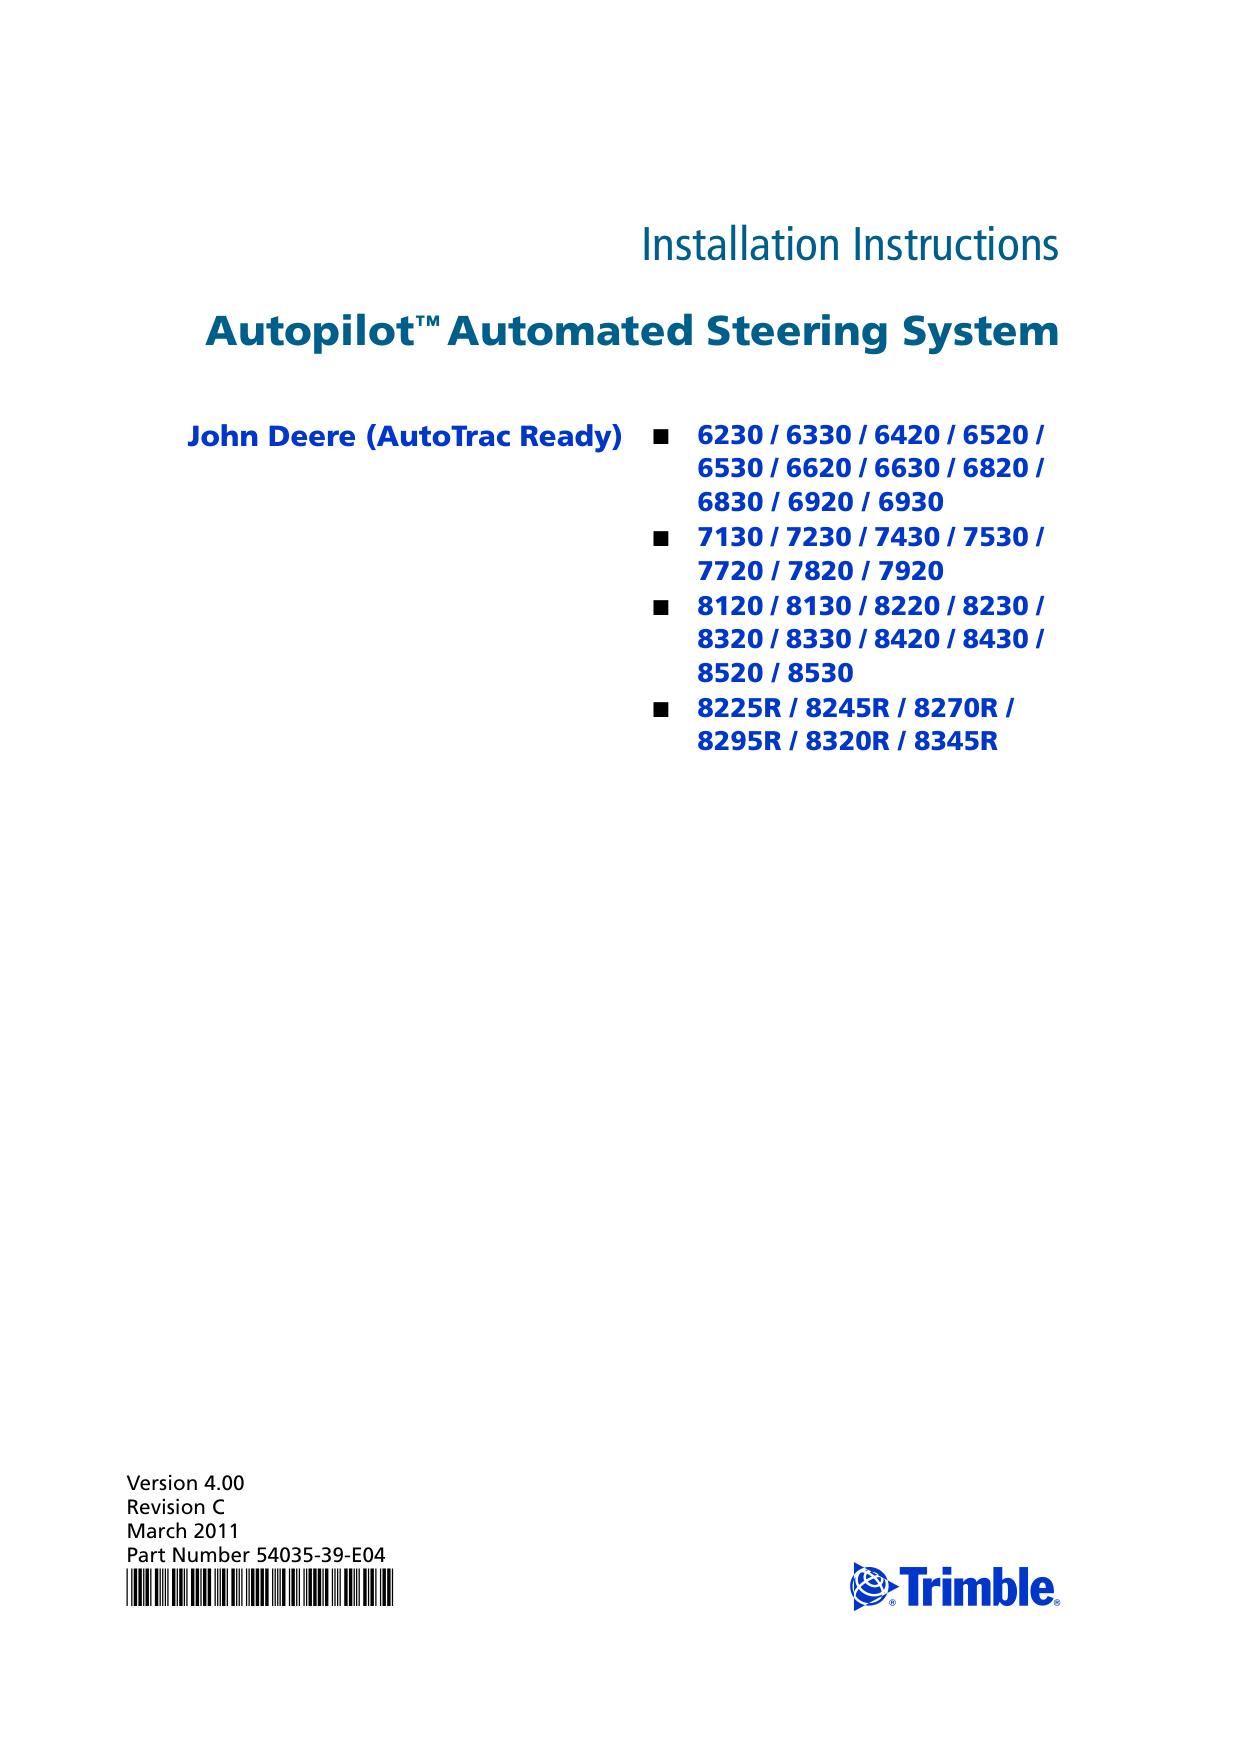 Autopilot System Installation Instructions | manualzz com